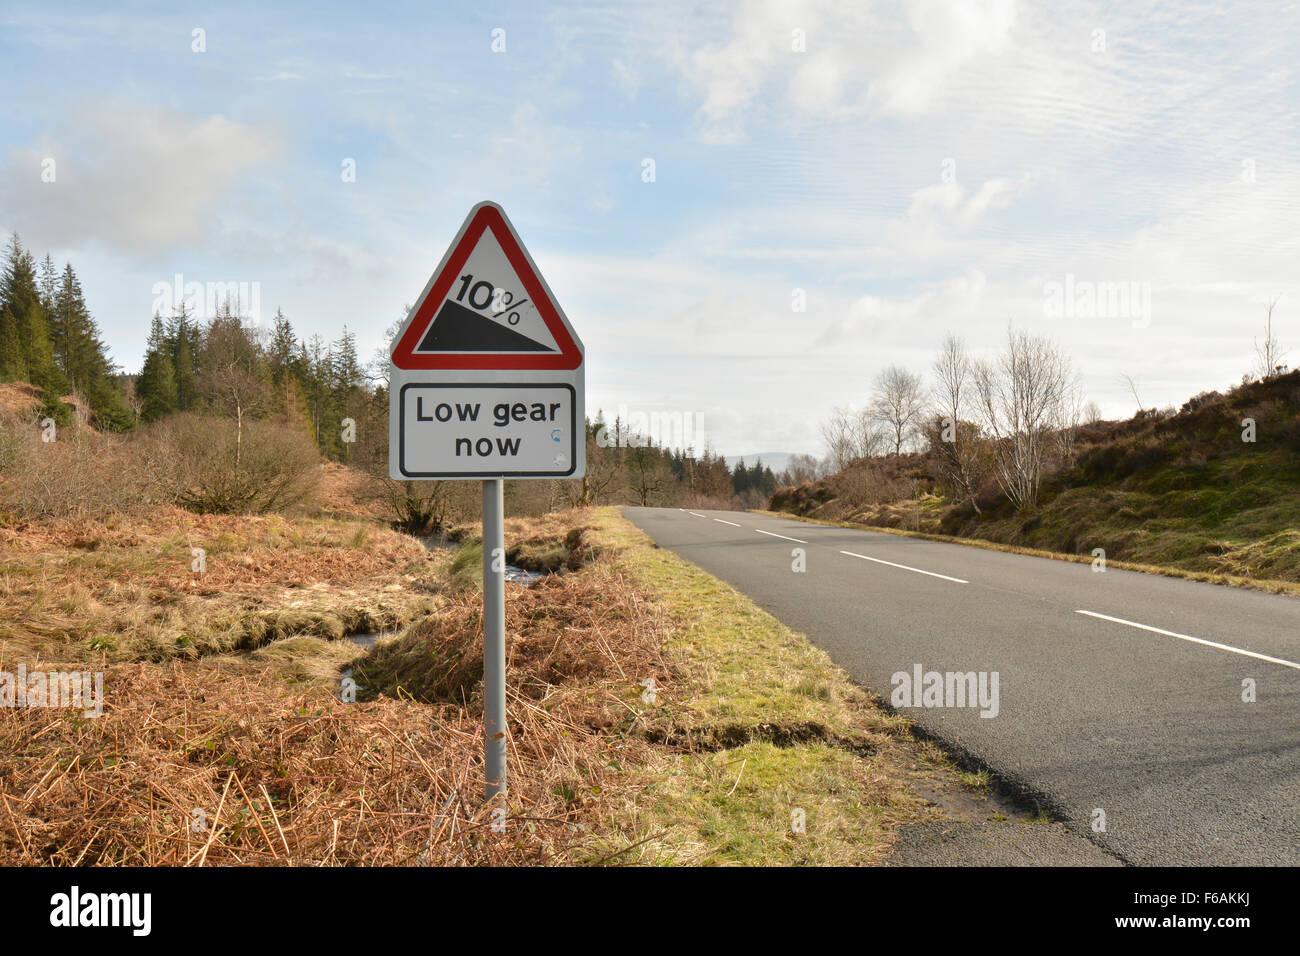 Dukes Pass, Trossachs, Scotland, UK - 10% gradient road sign, low gear now - Stock Image